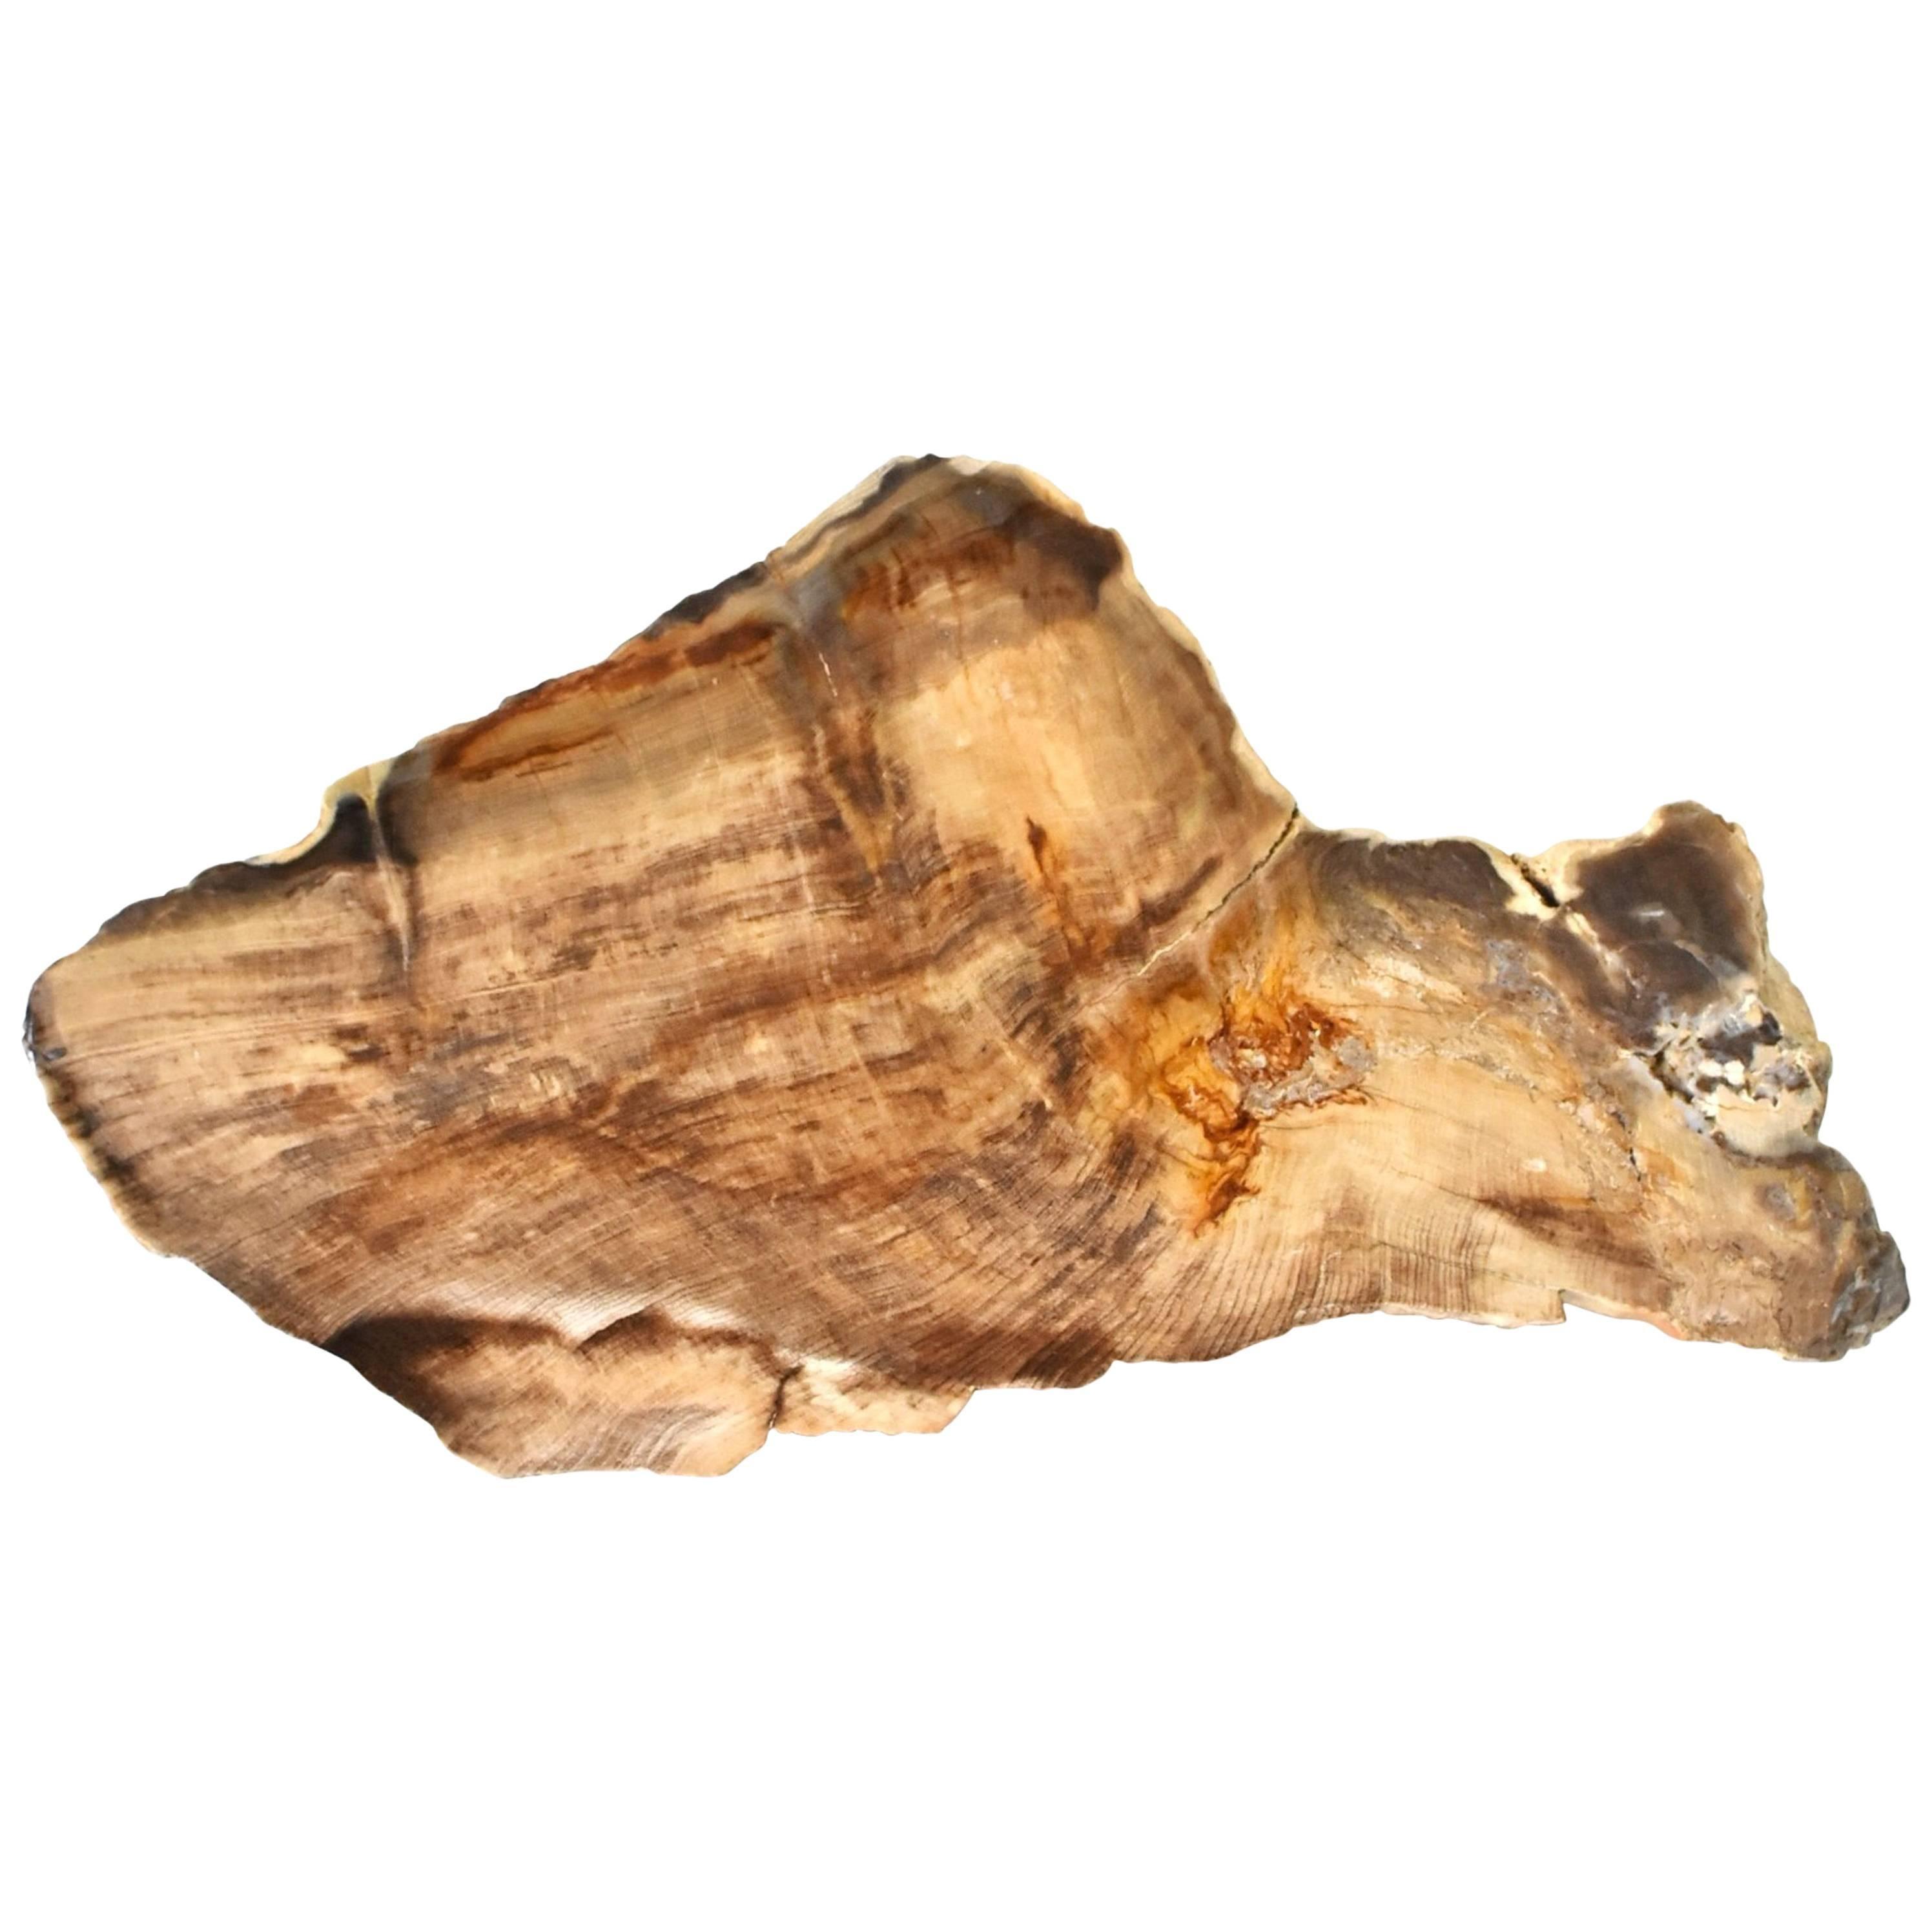 Petrified Wood Specimen